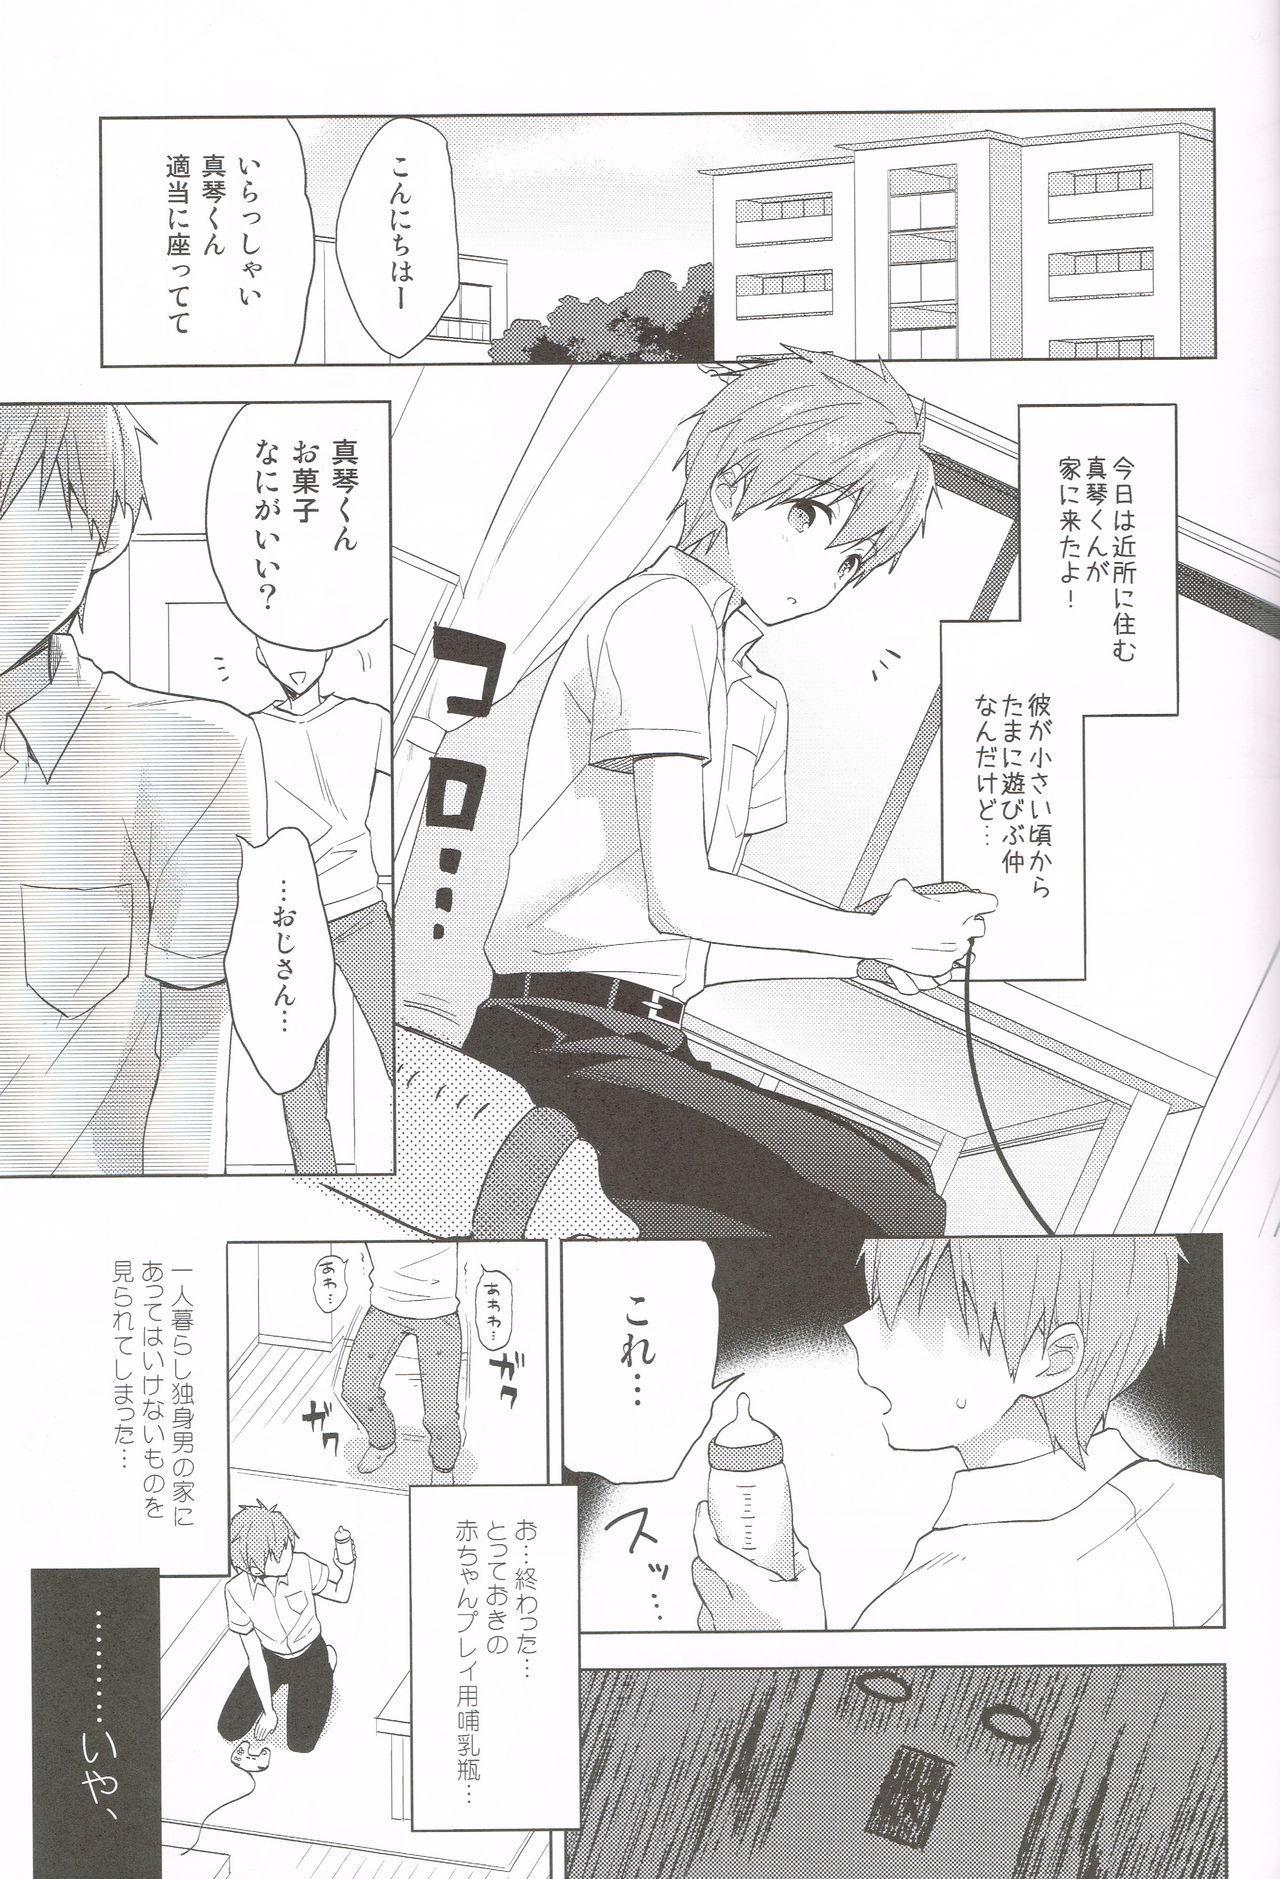 Makoto-kun to Omamagoto 3